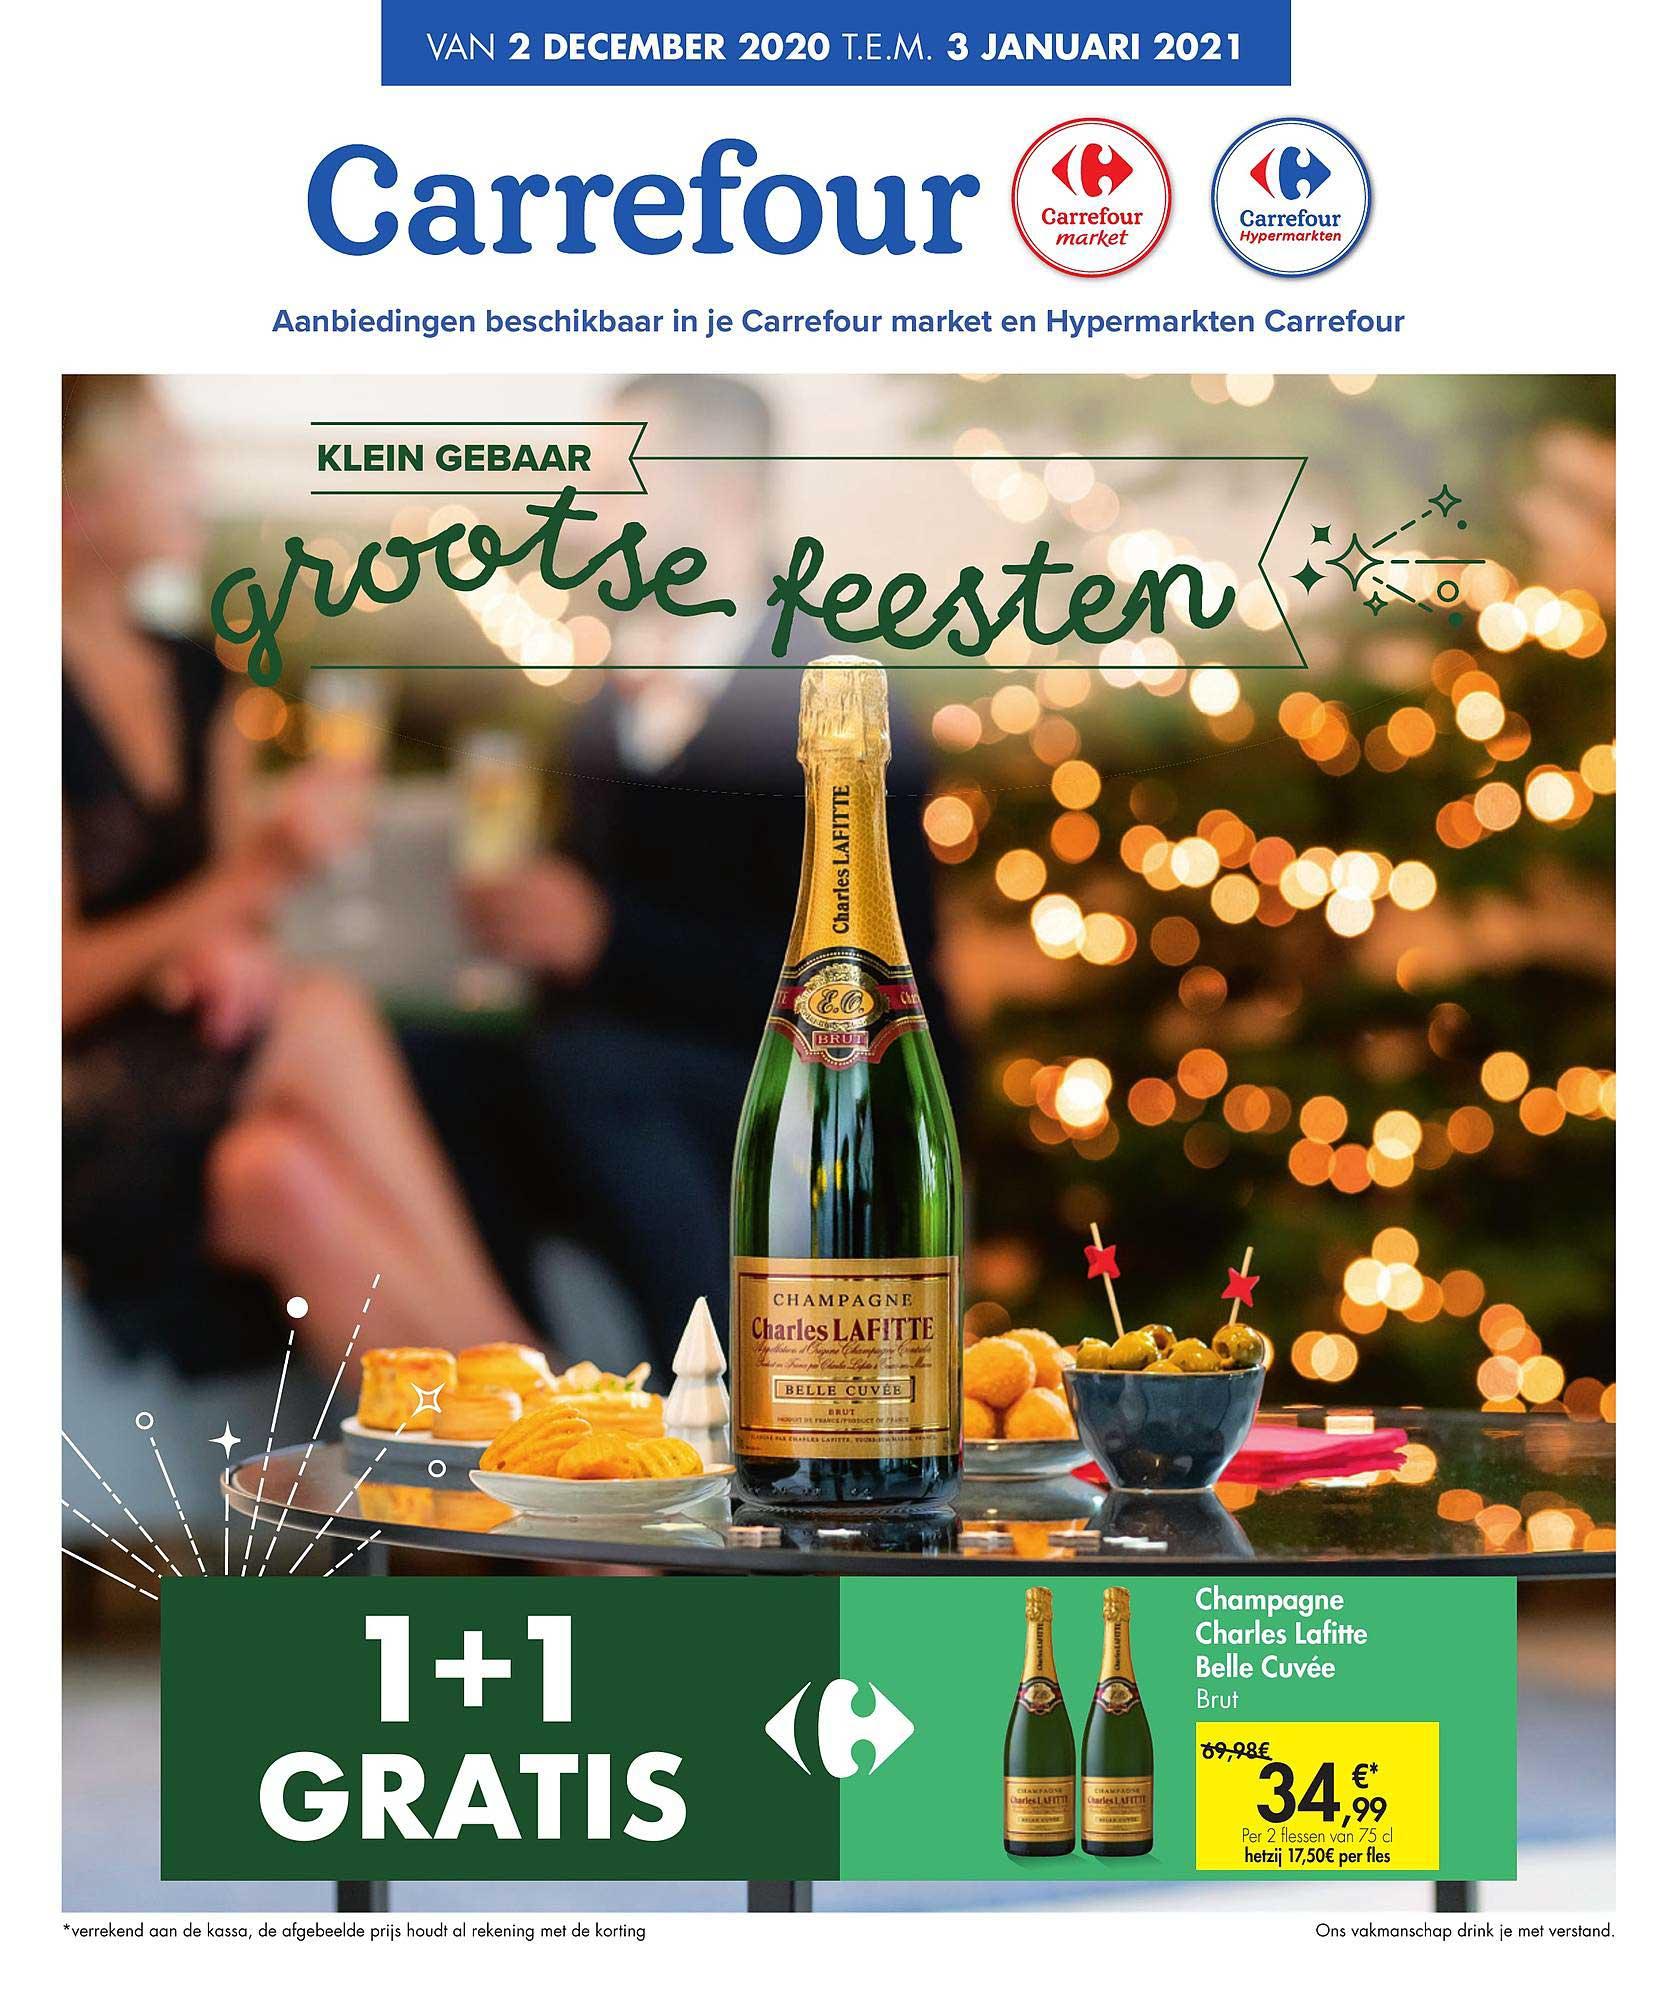 Carrefour 1+1 Gratis Champagne Charles Lafitte Belle Cuvee